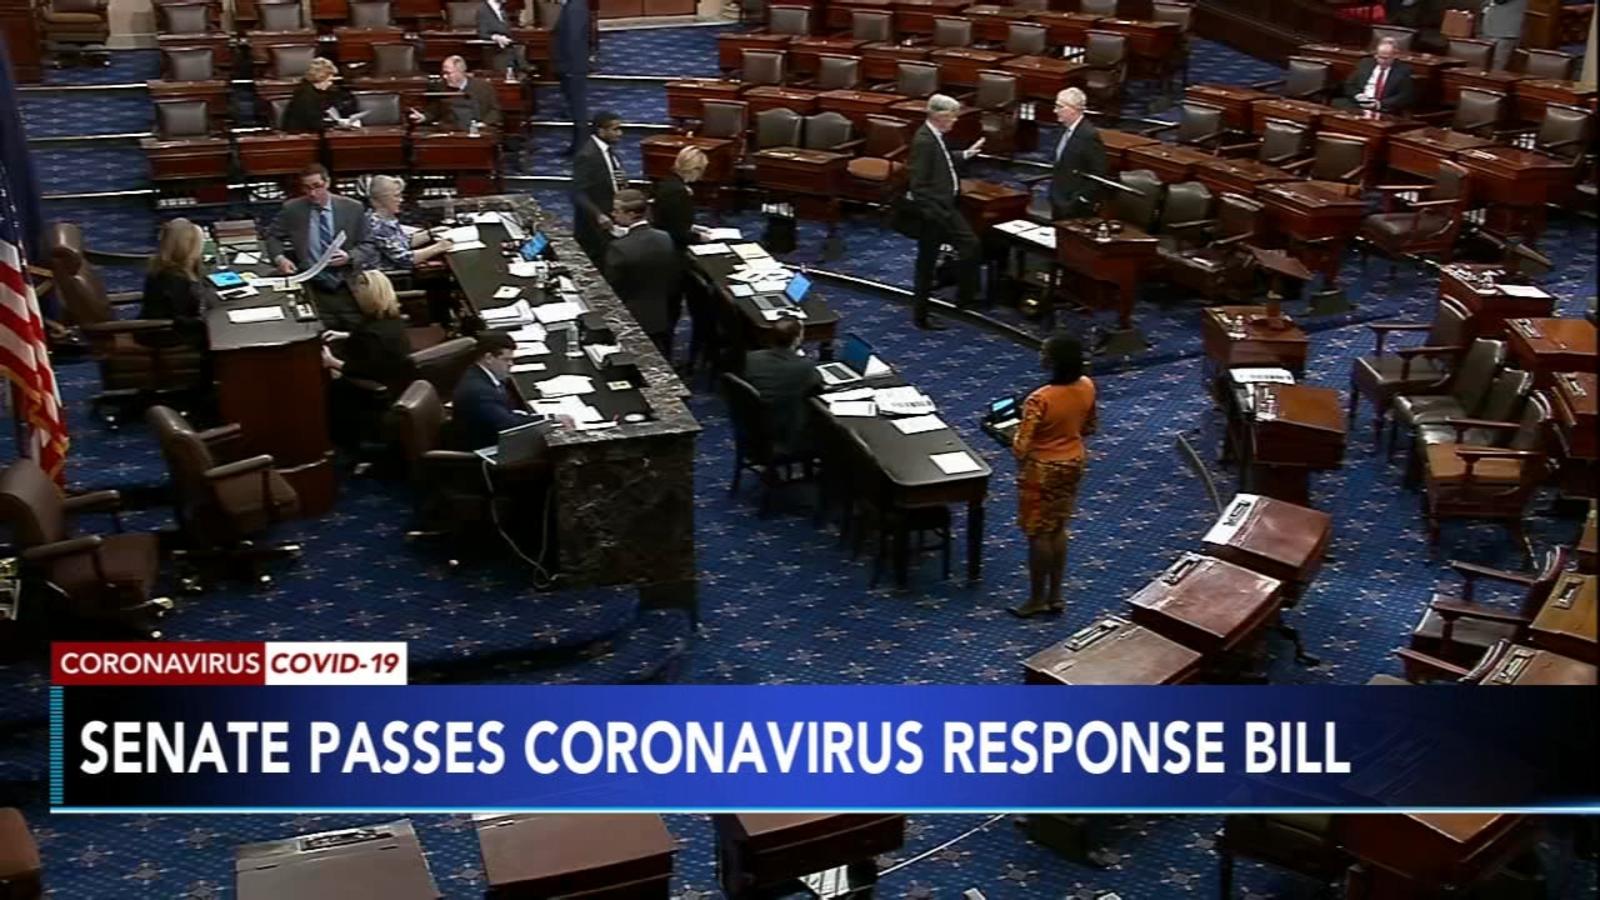 Coronavirus Senate Overwhelmingly Passes Covid 19 Relief Measure Ensuring Paid Sick Emergency Leave 6abc Philadelphia